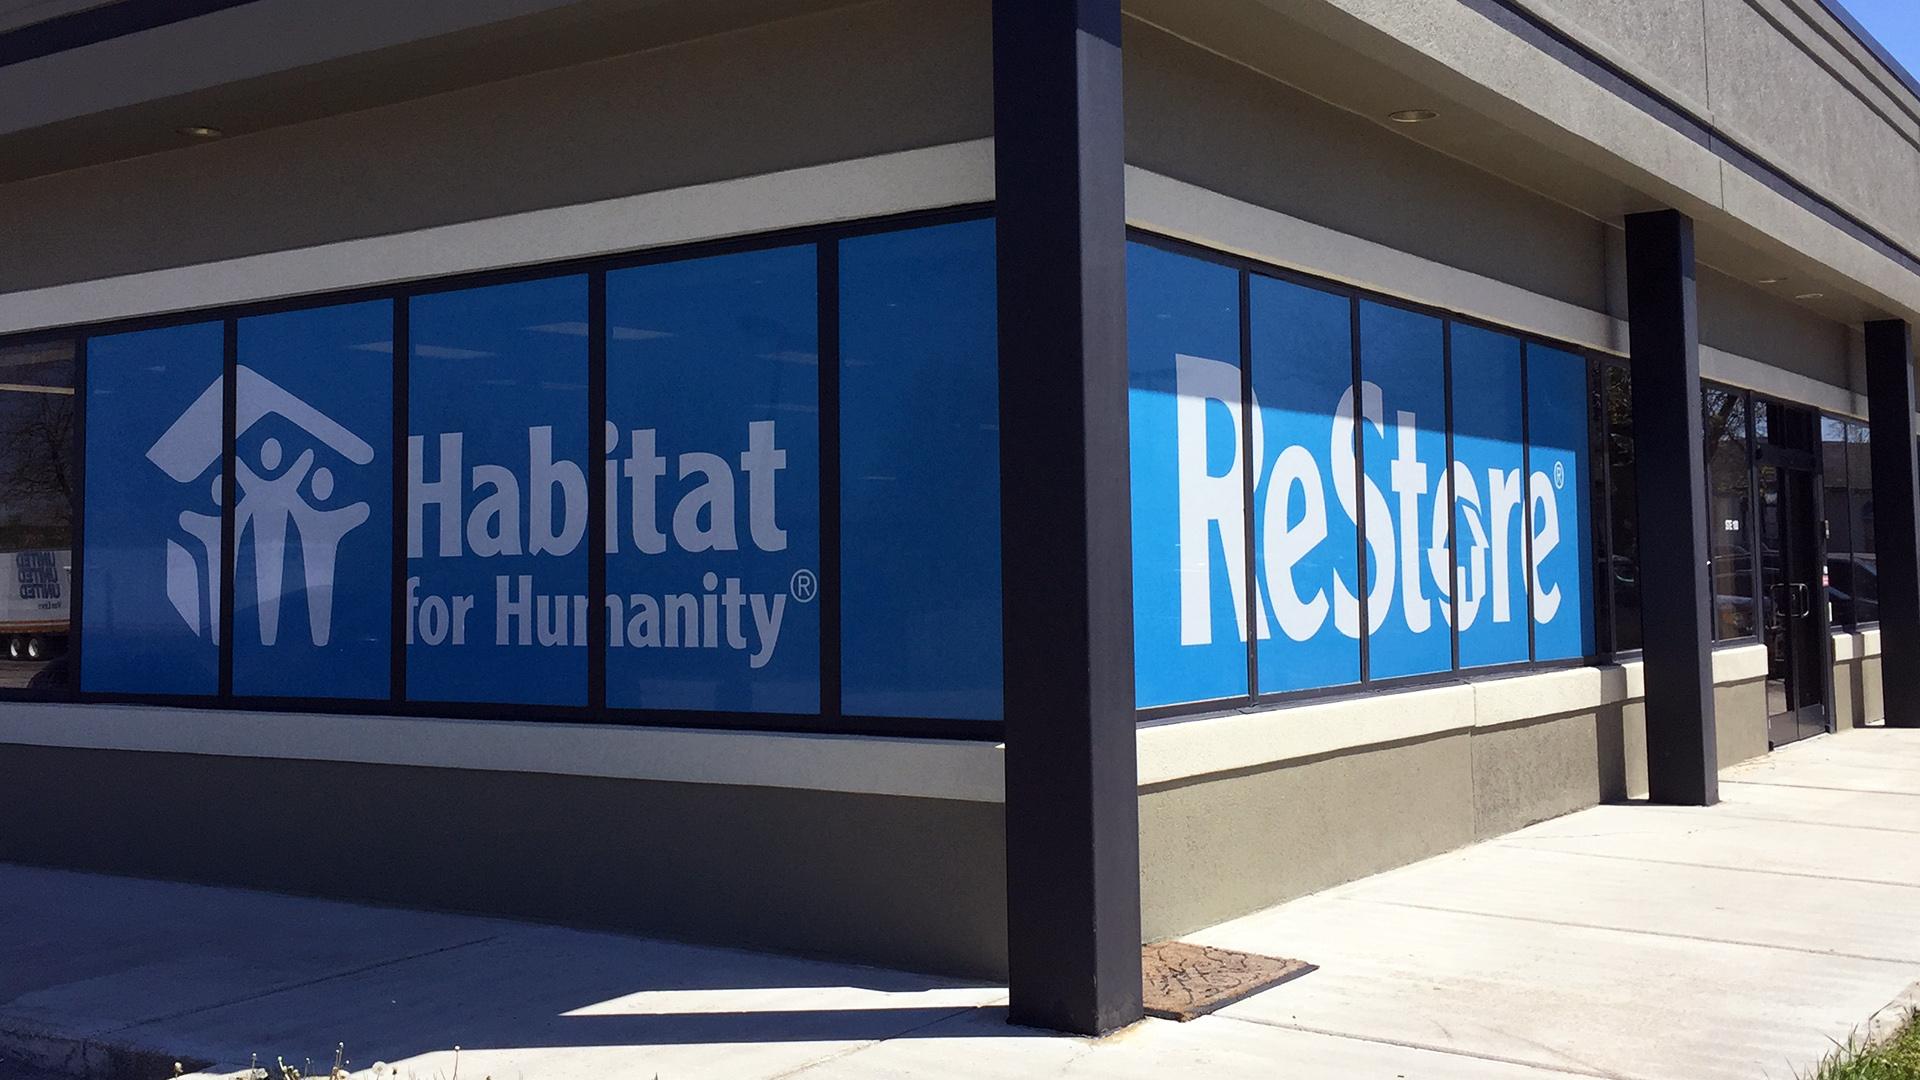 Habitat for humanity window design